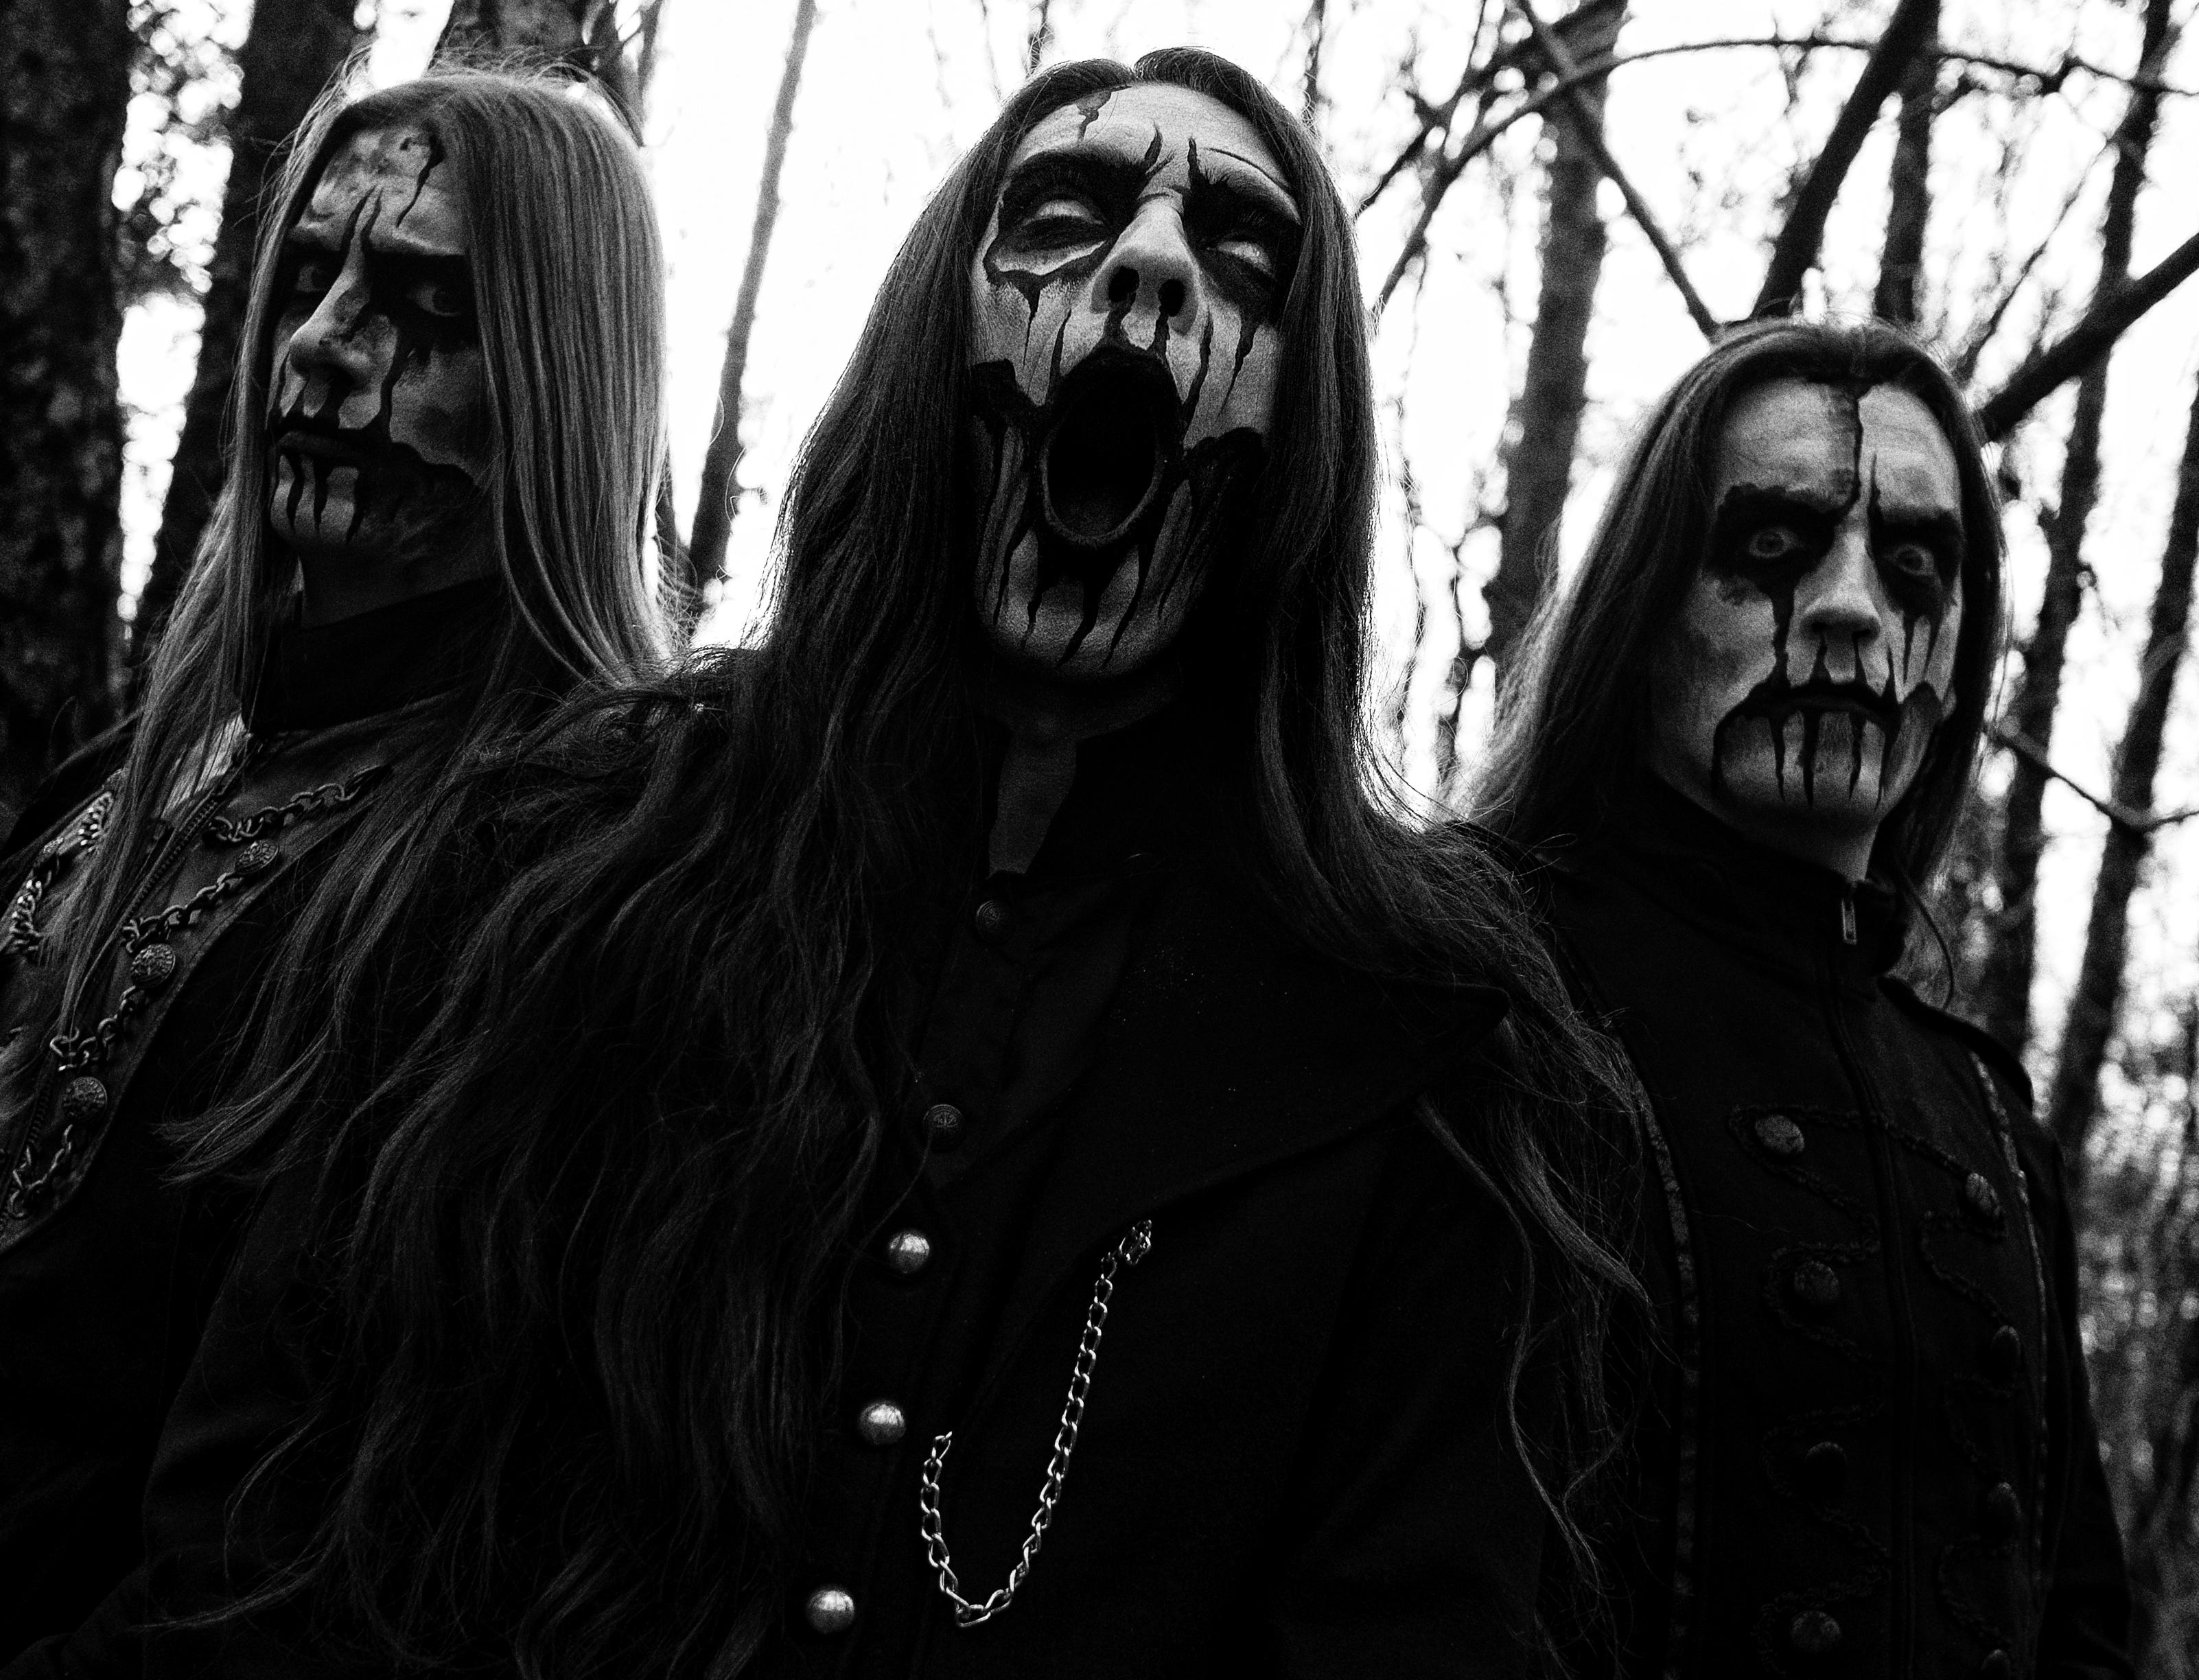 Carach angren black metal heavy dark g wallpaper - Black metal wallpaper ...